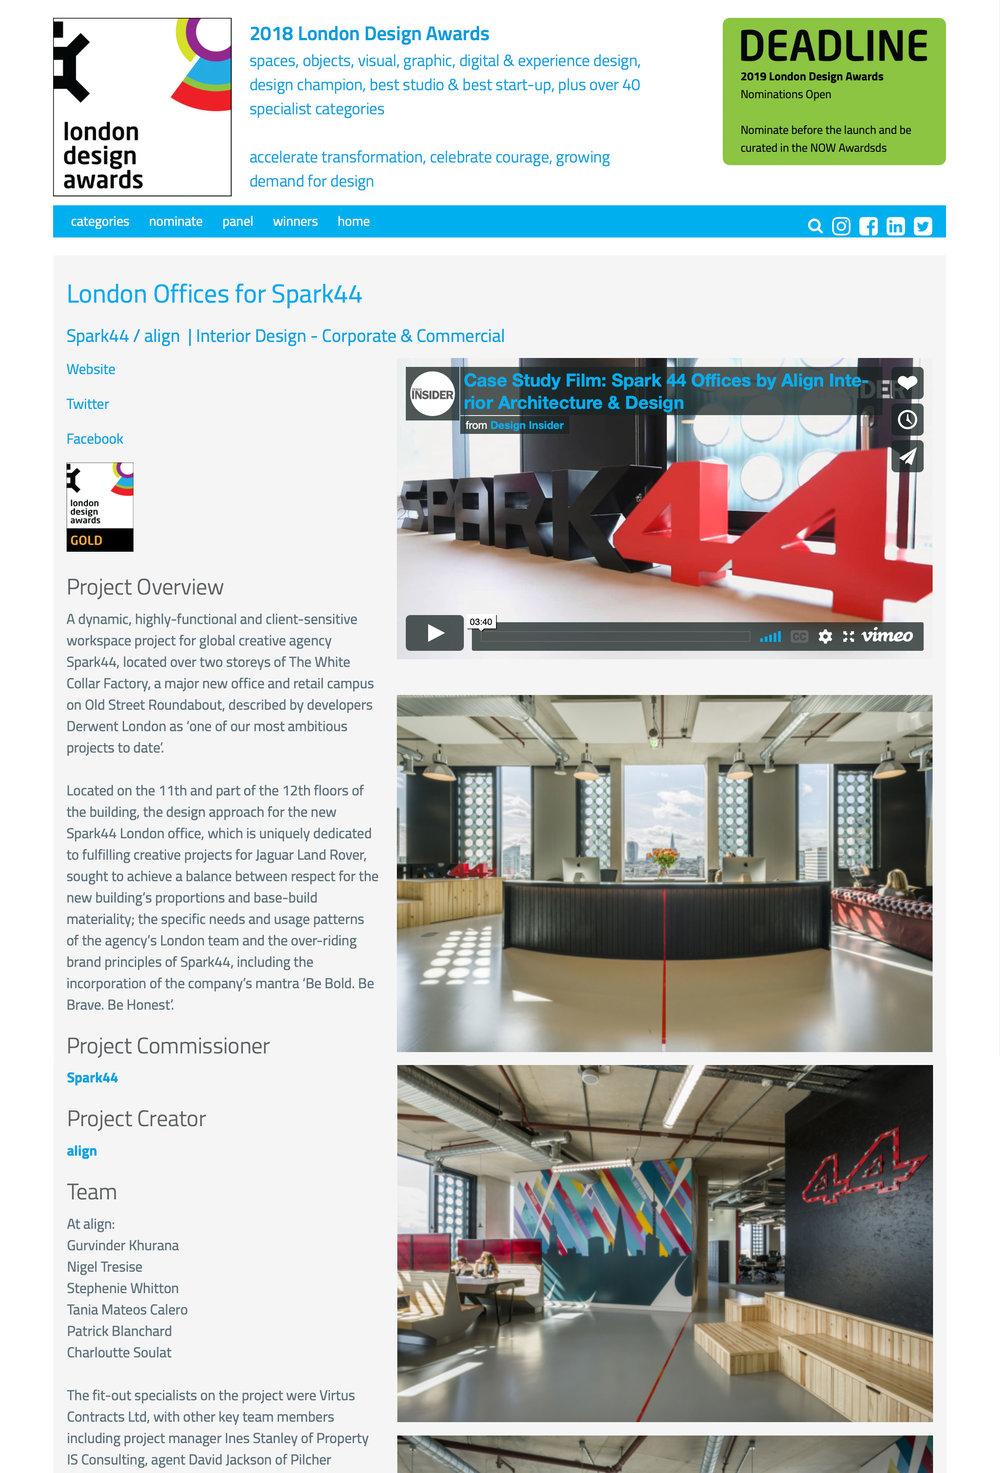 london-design-awards-spark44.jpg